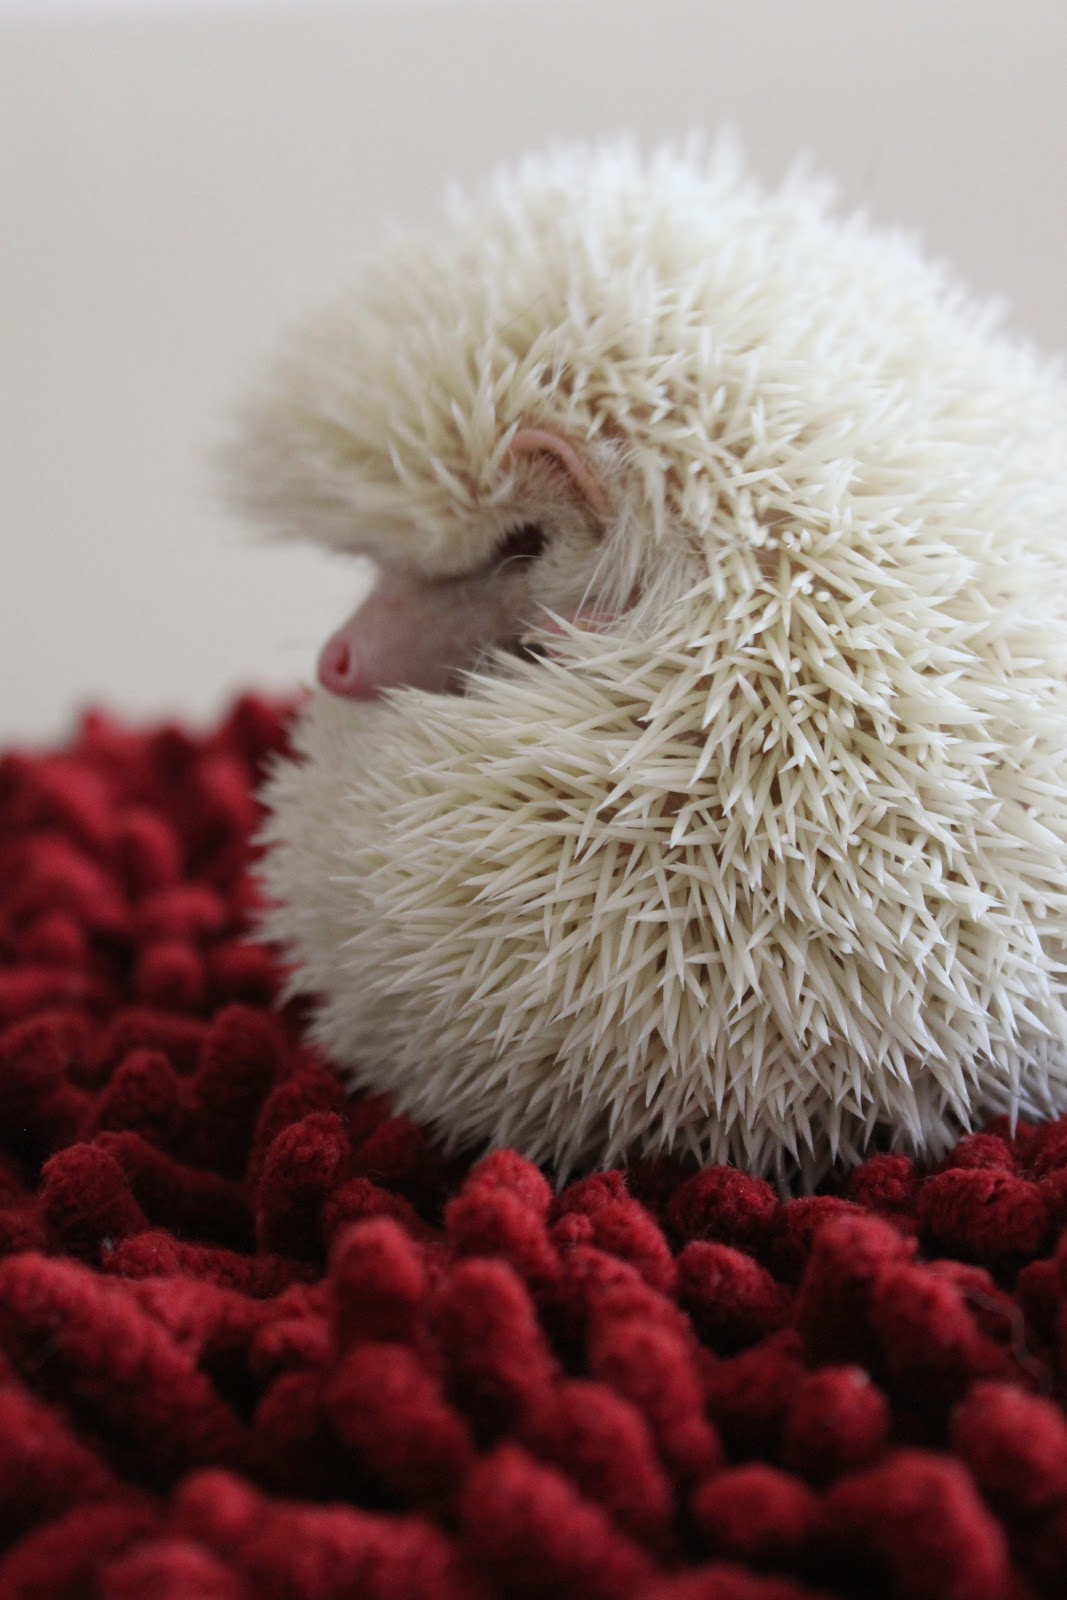 Arbitrary Photo Albino Hedgehog